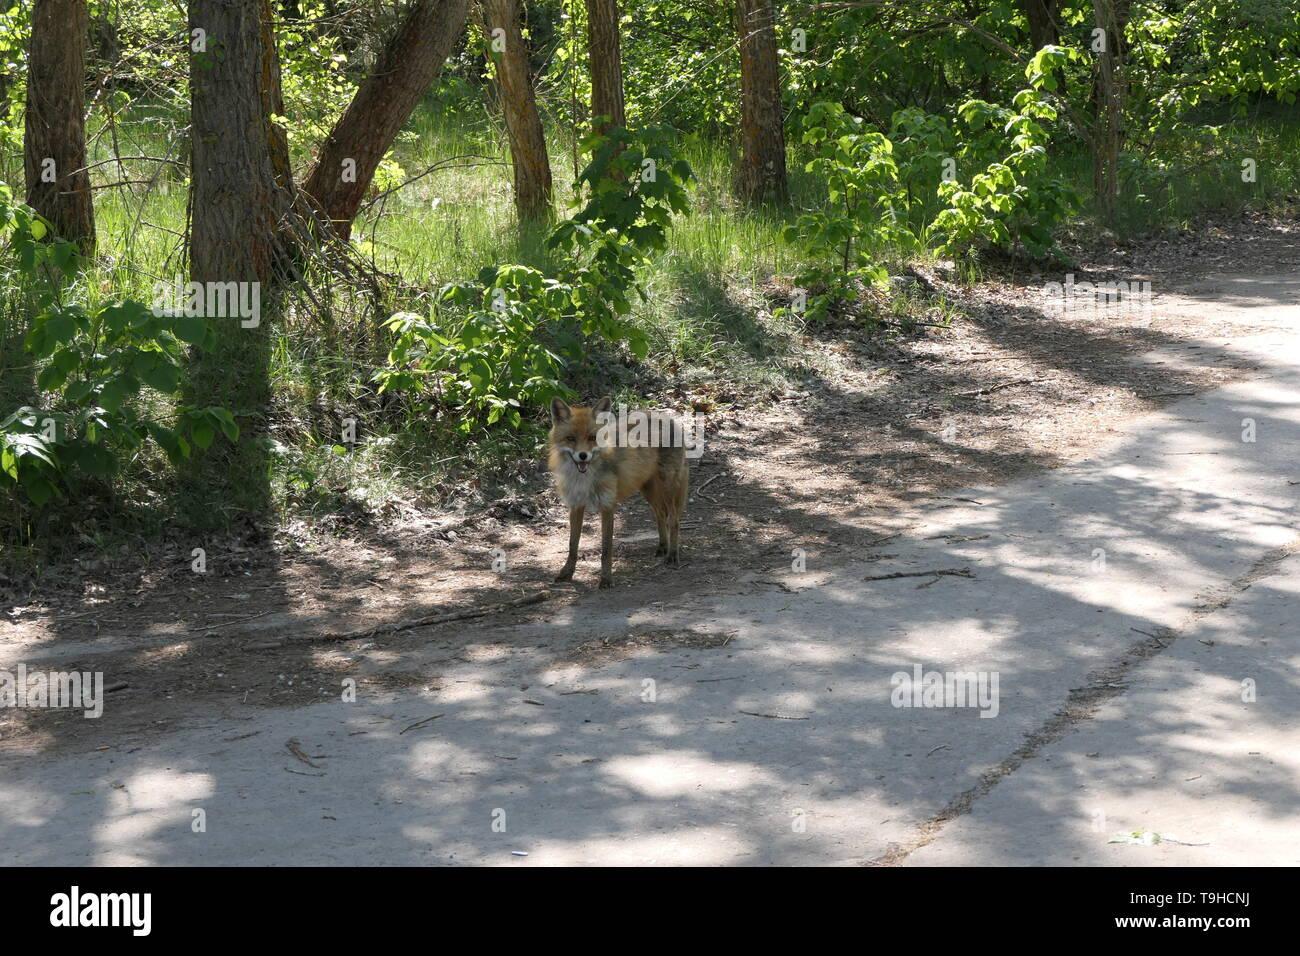 Wild fox in the Chernobyl exclusion zone, Ukraine - Stock Image